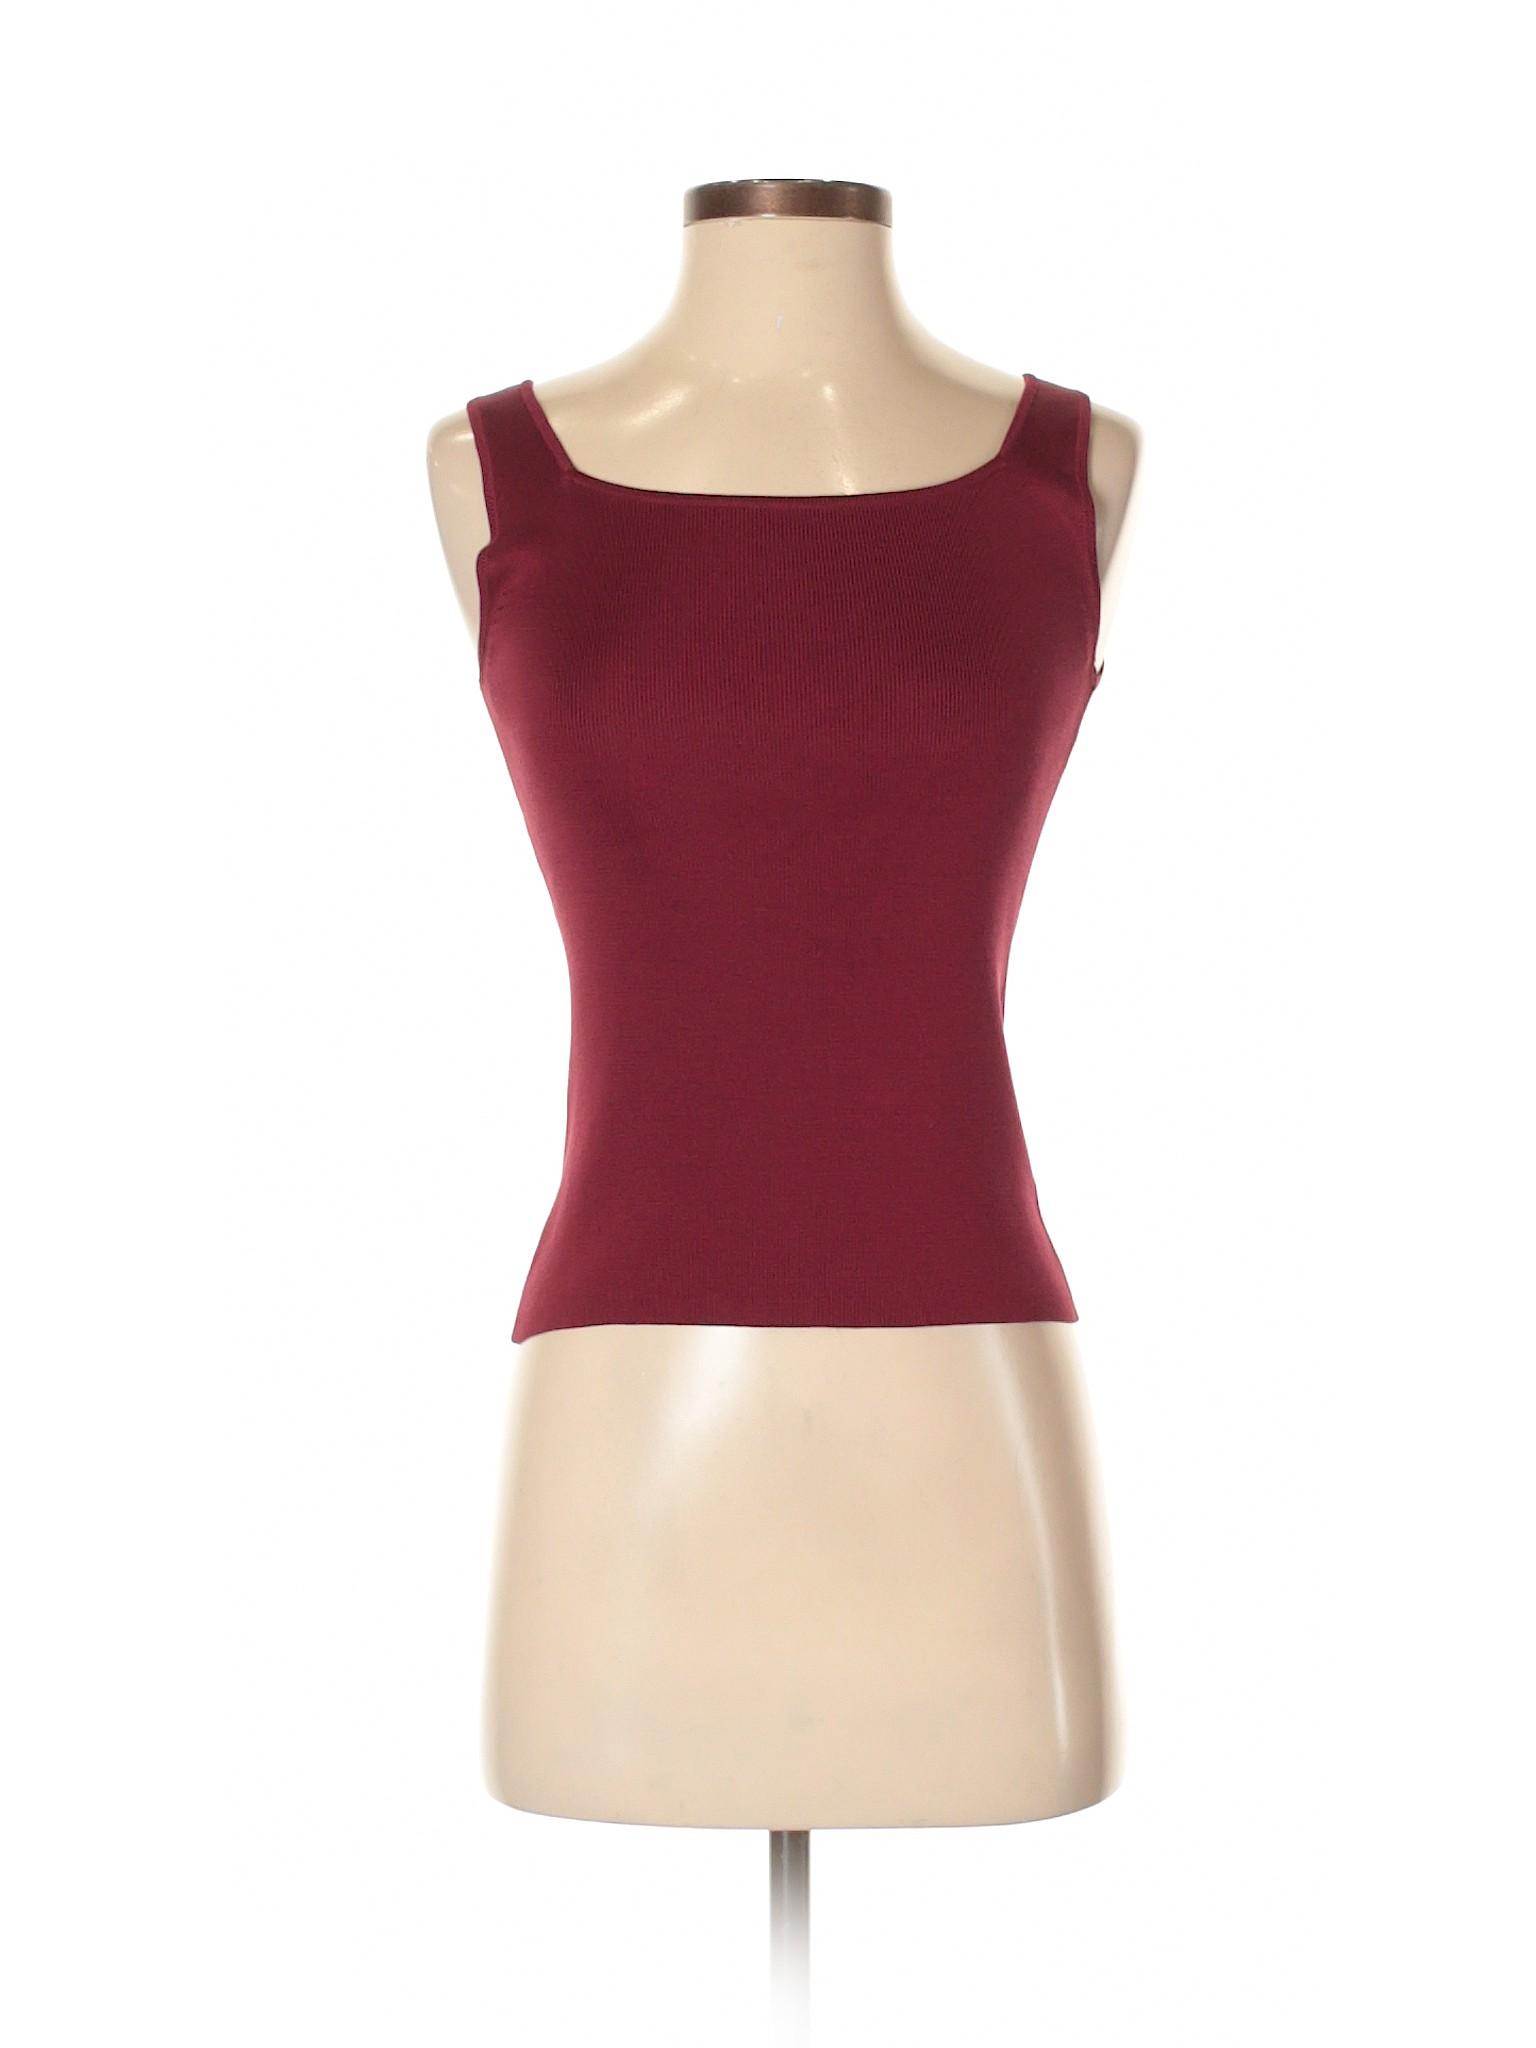 Boutique Sweater Pullover Taylor LOFT Silk Ann Tx47Tq